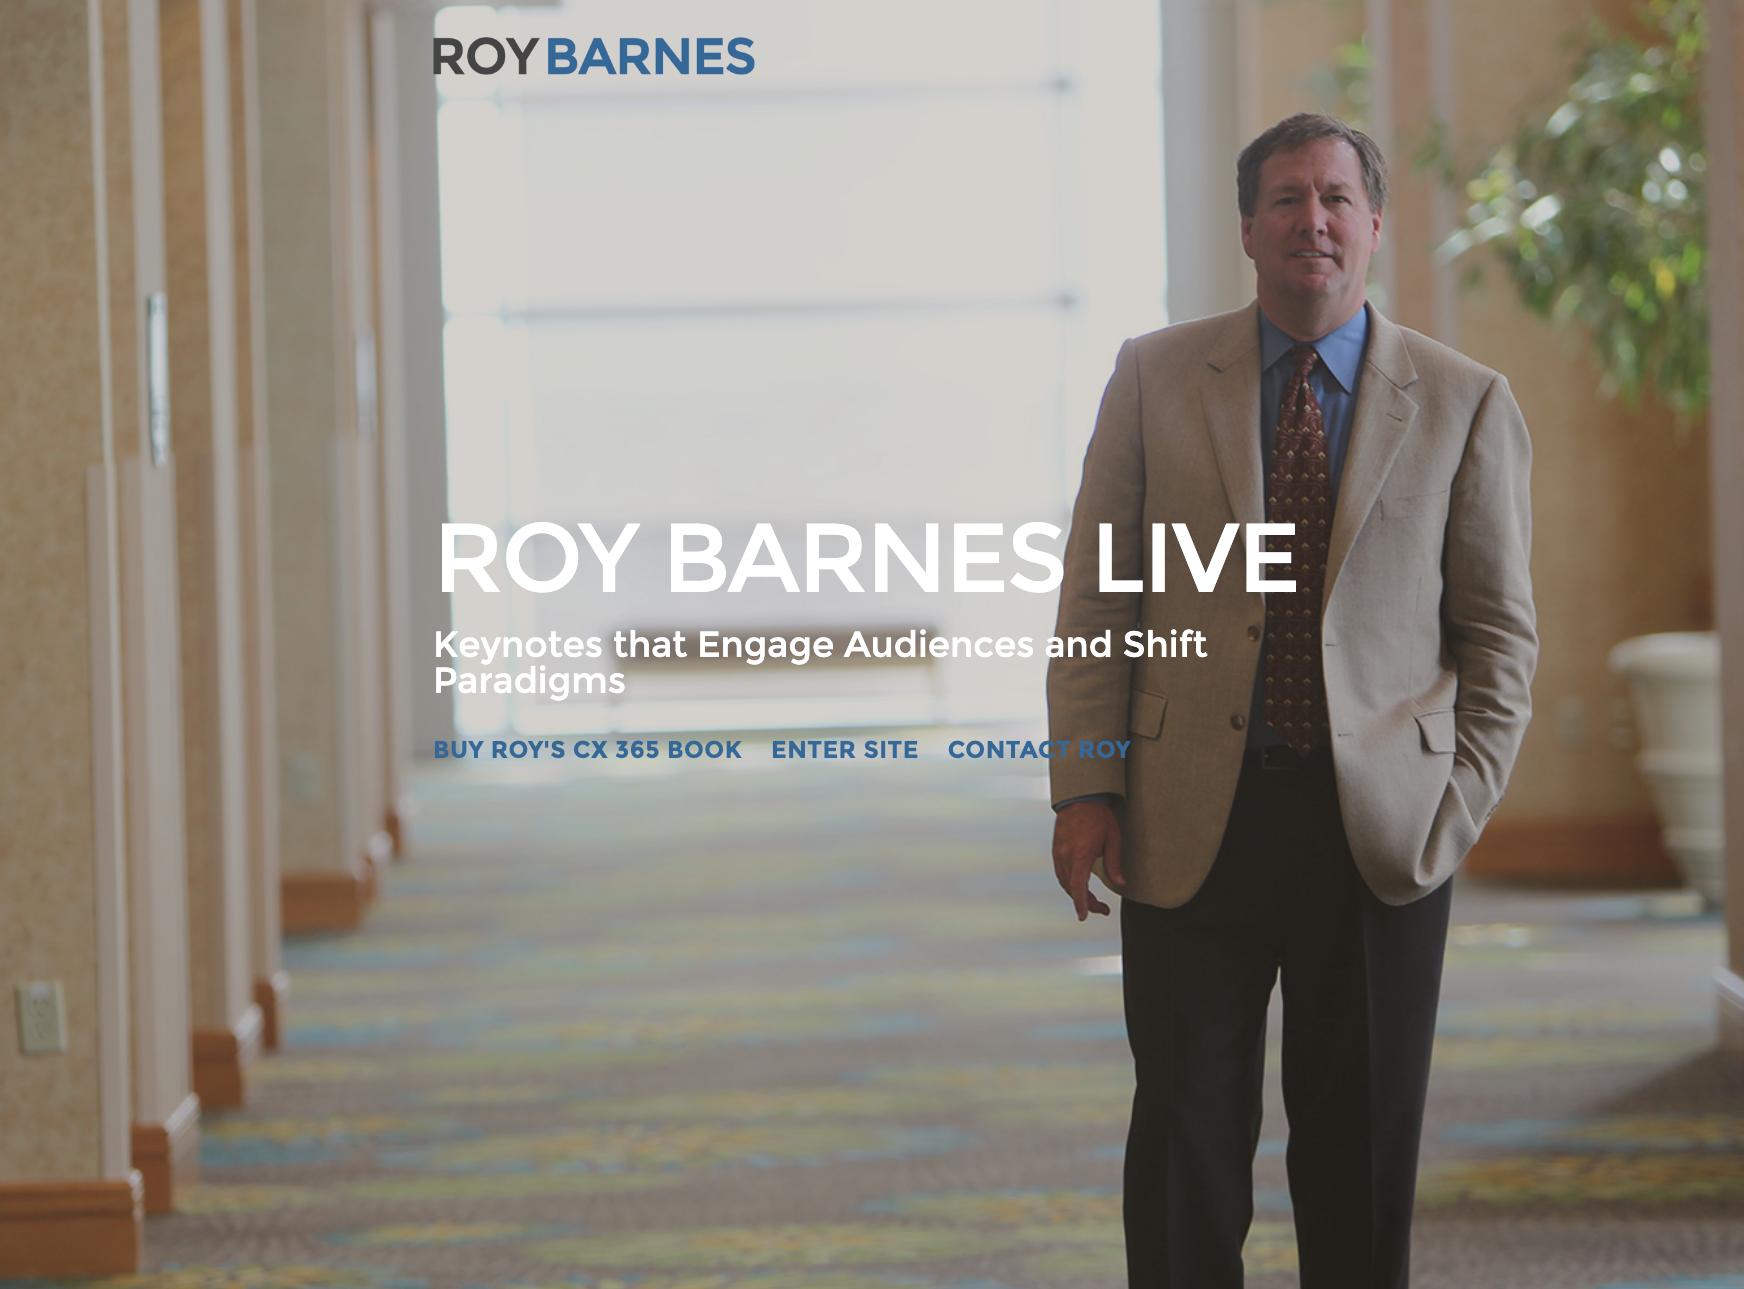 http://www.roybarneslive.com/